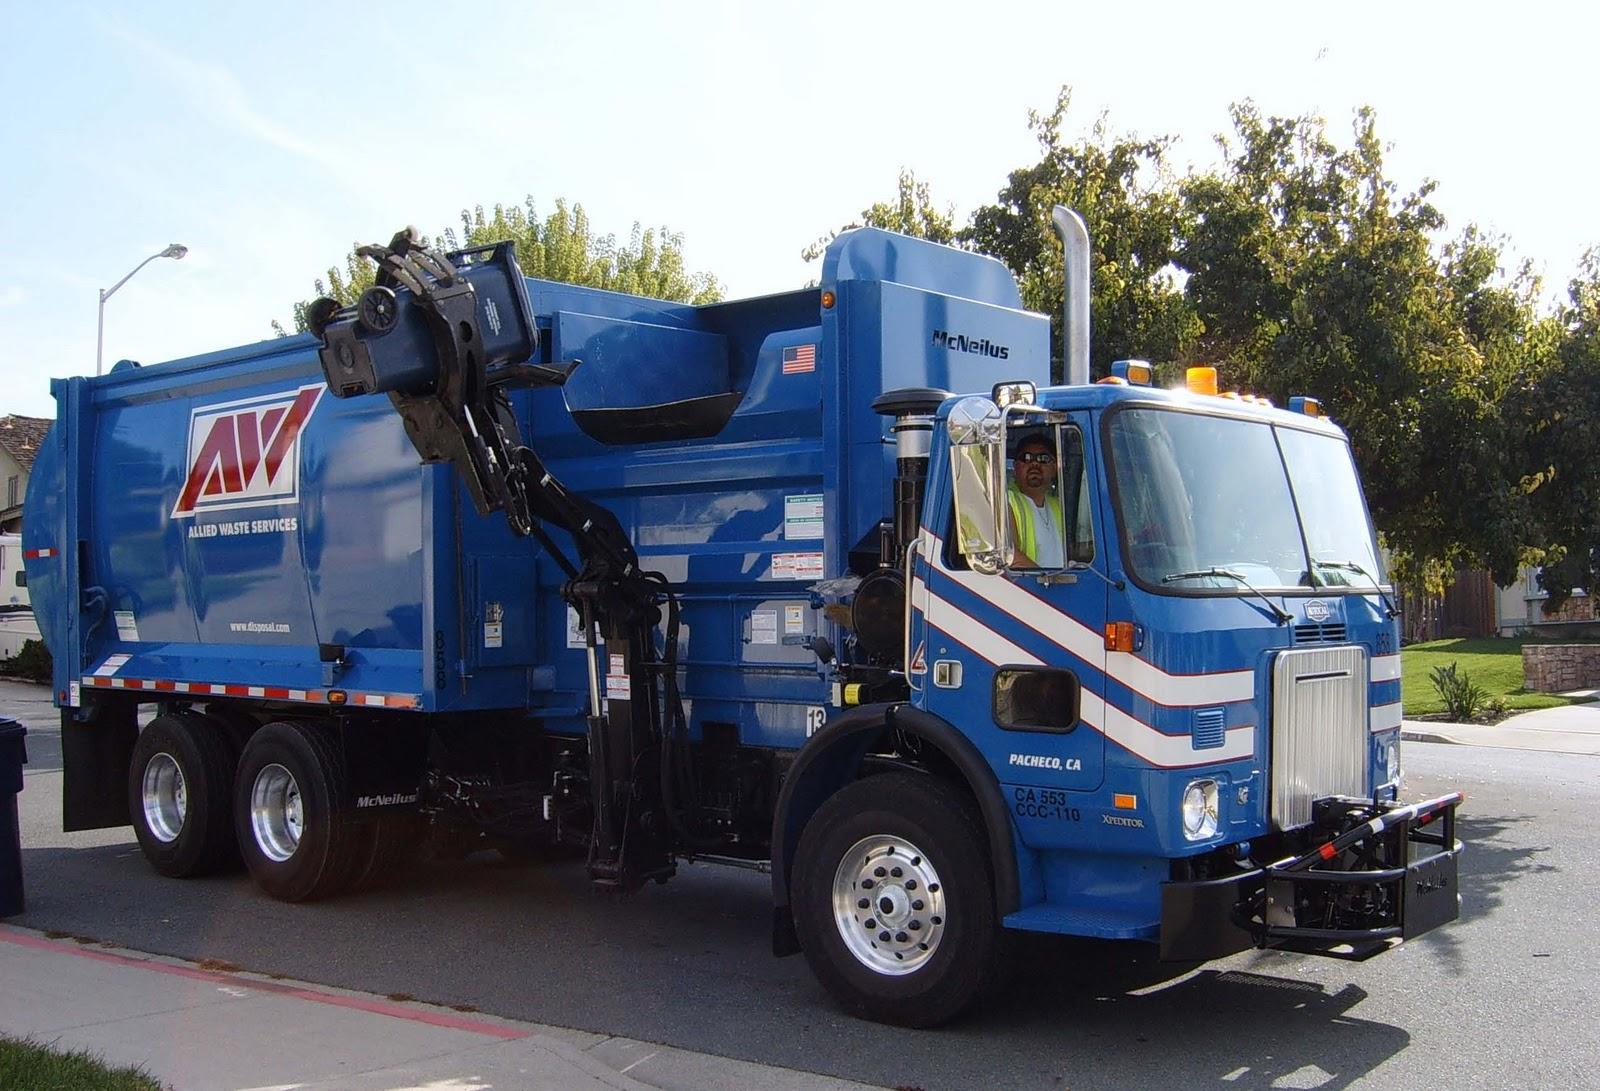 http://2.bp.blogspot.com/-AWBfO6OSk_Y/TWSXE3gW9vI/AAAAAAAALQk/88aeg1tvIGo/s1600/allied-truck.jpg